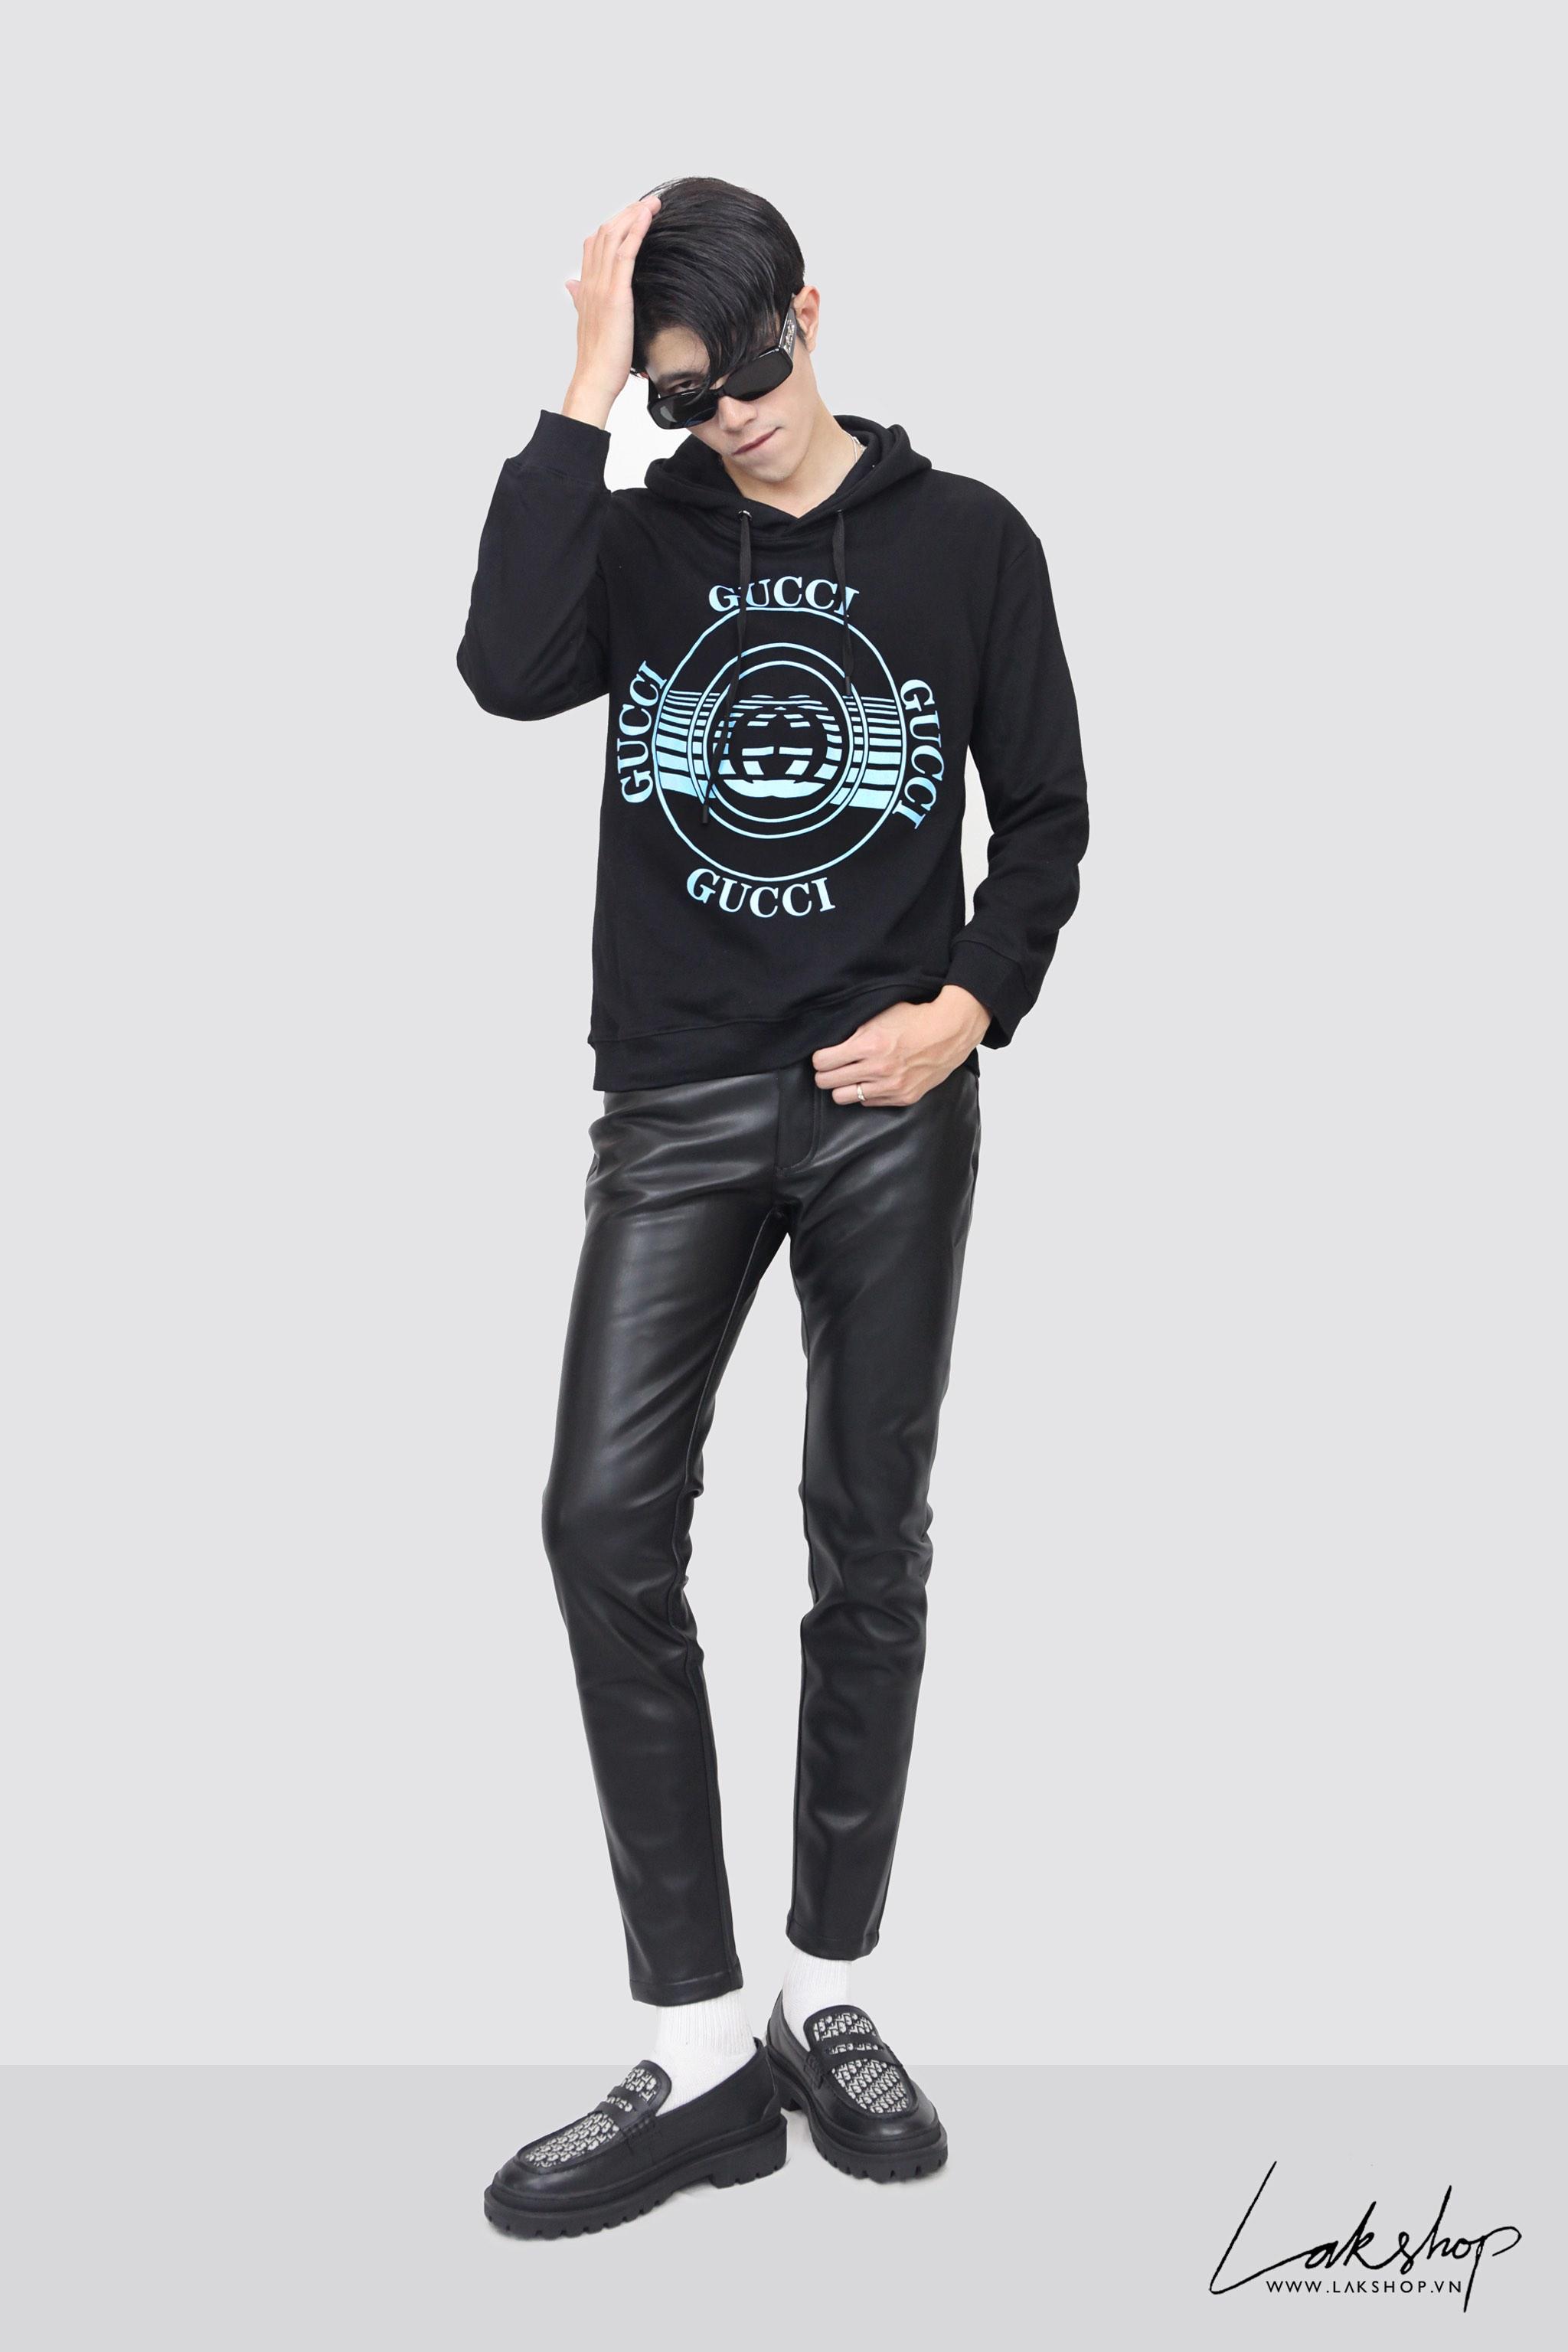 Gucci Logo Blue Square Oversized Hooded  Sweatshirt